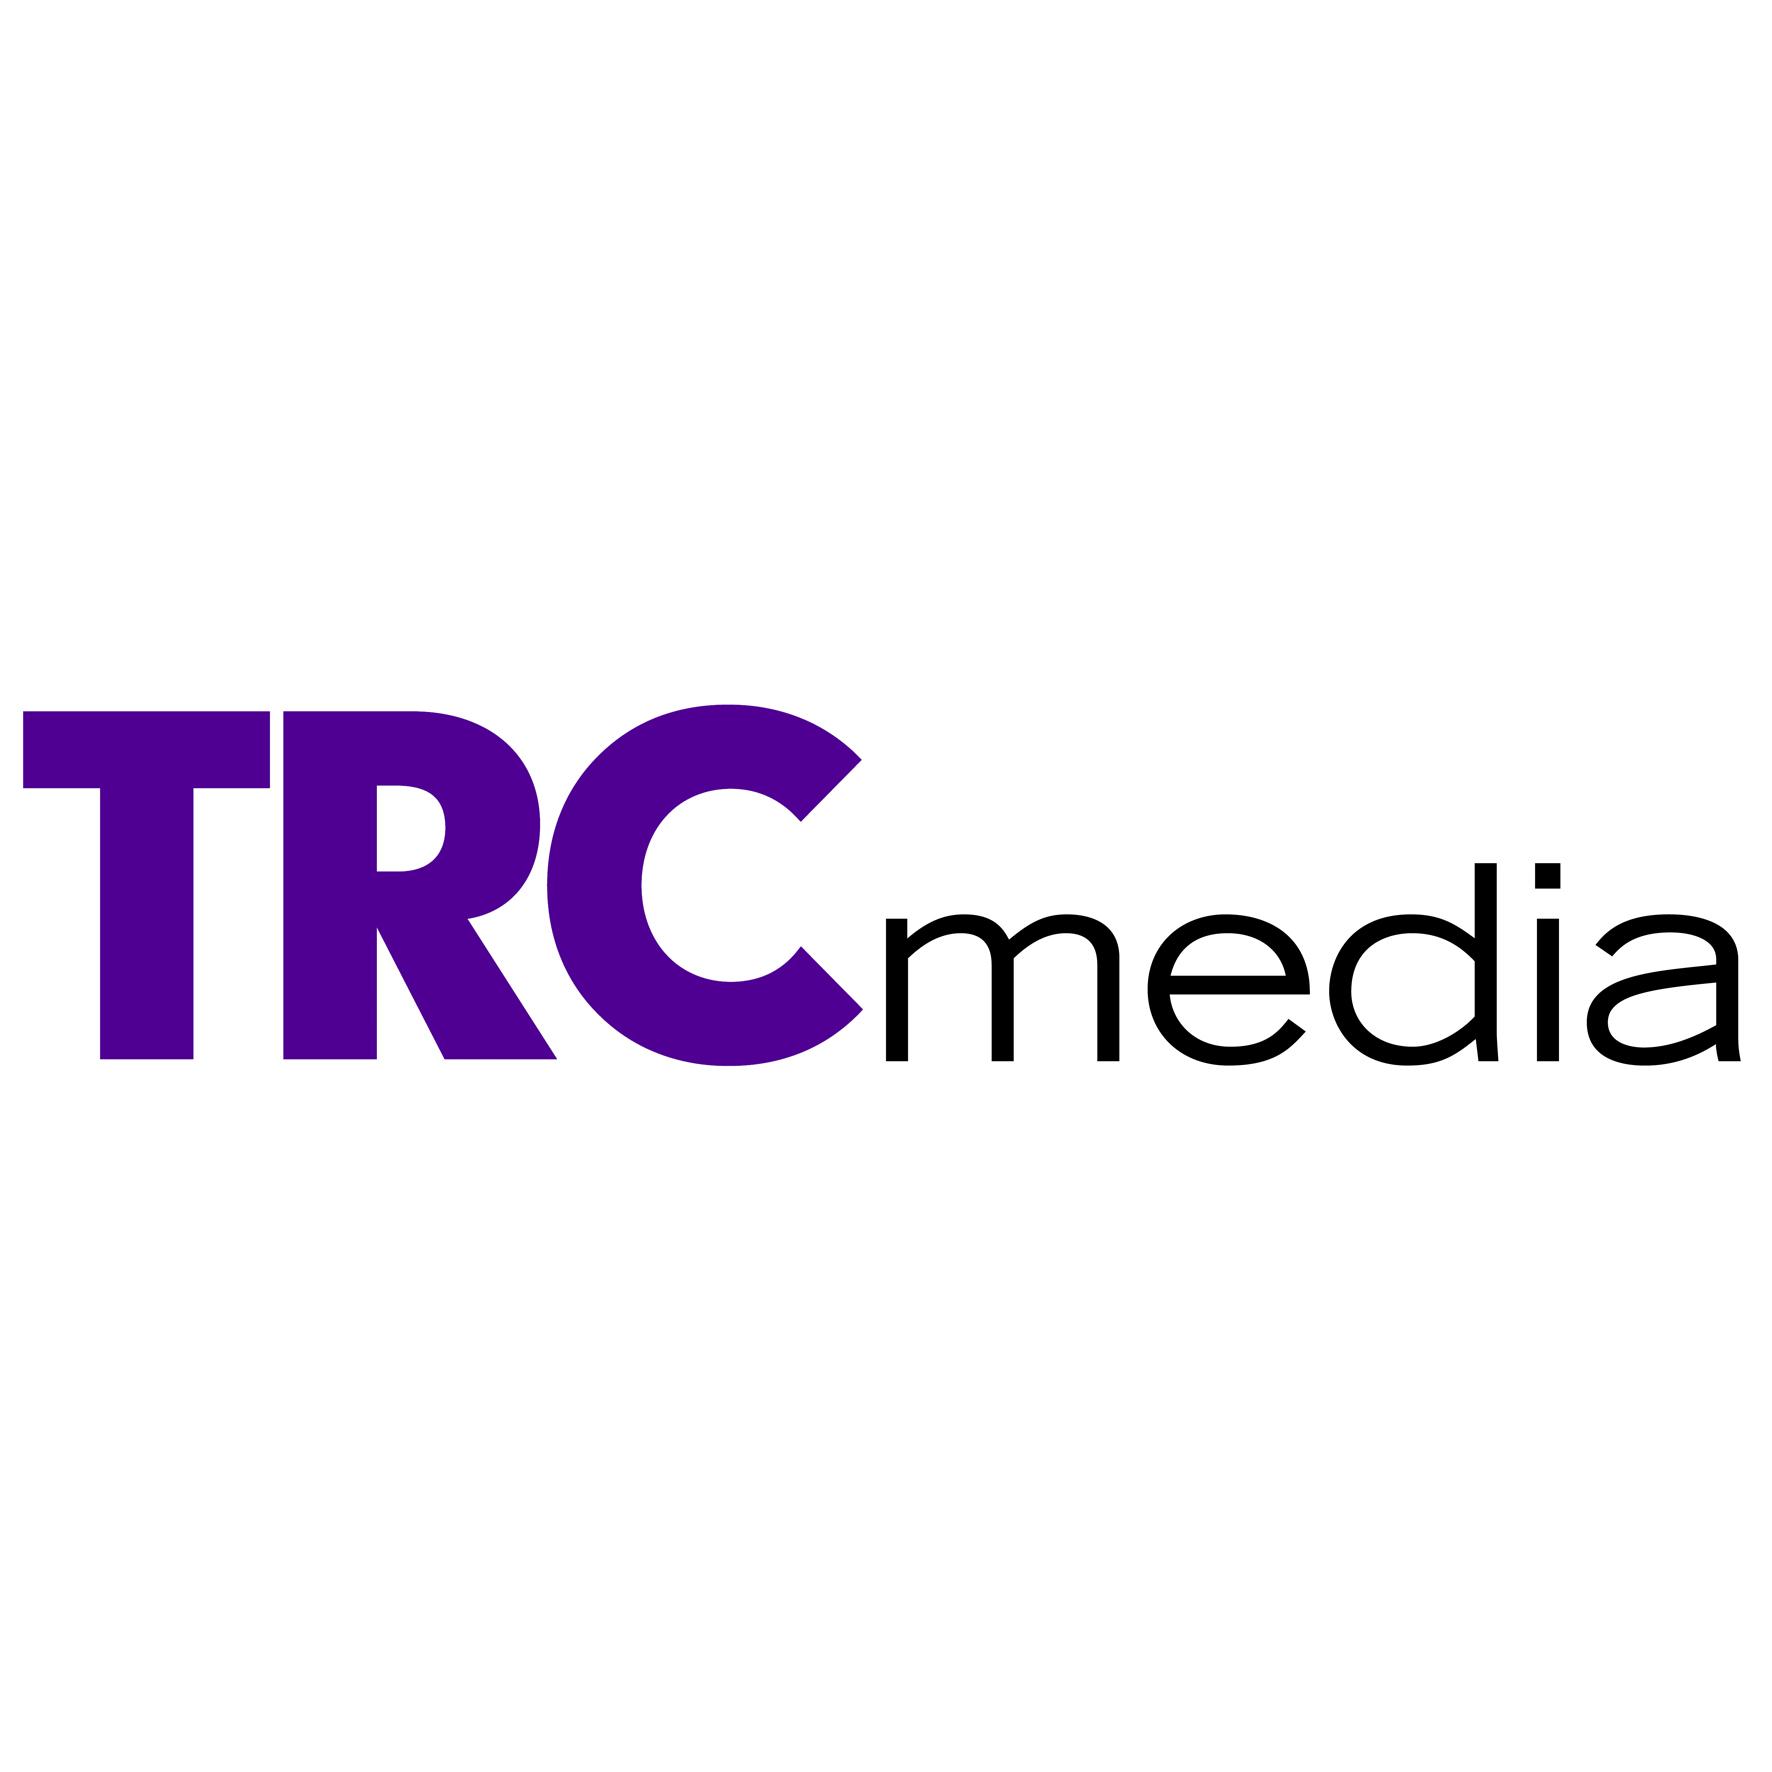 TRCmedia